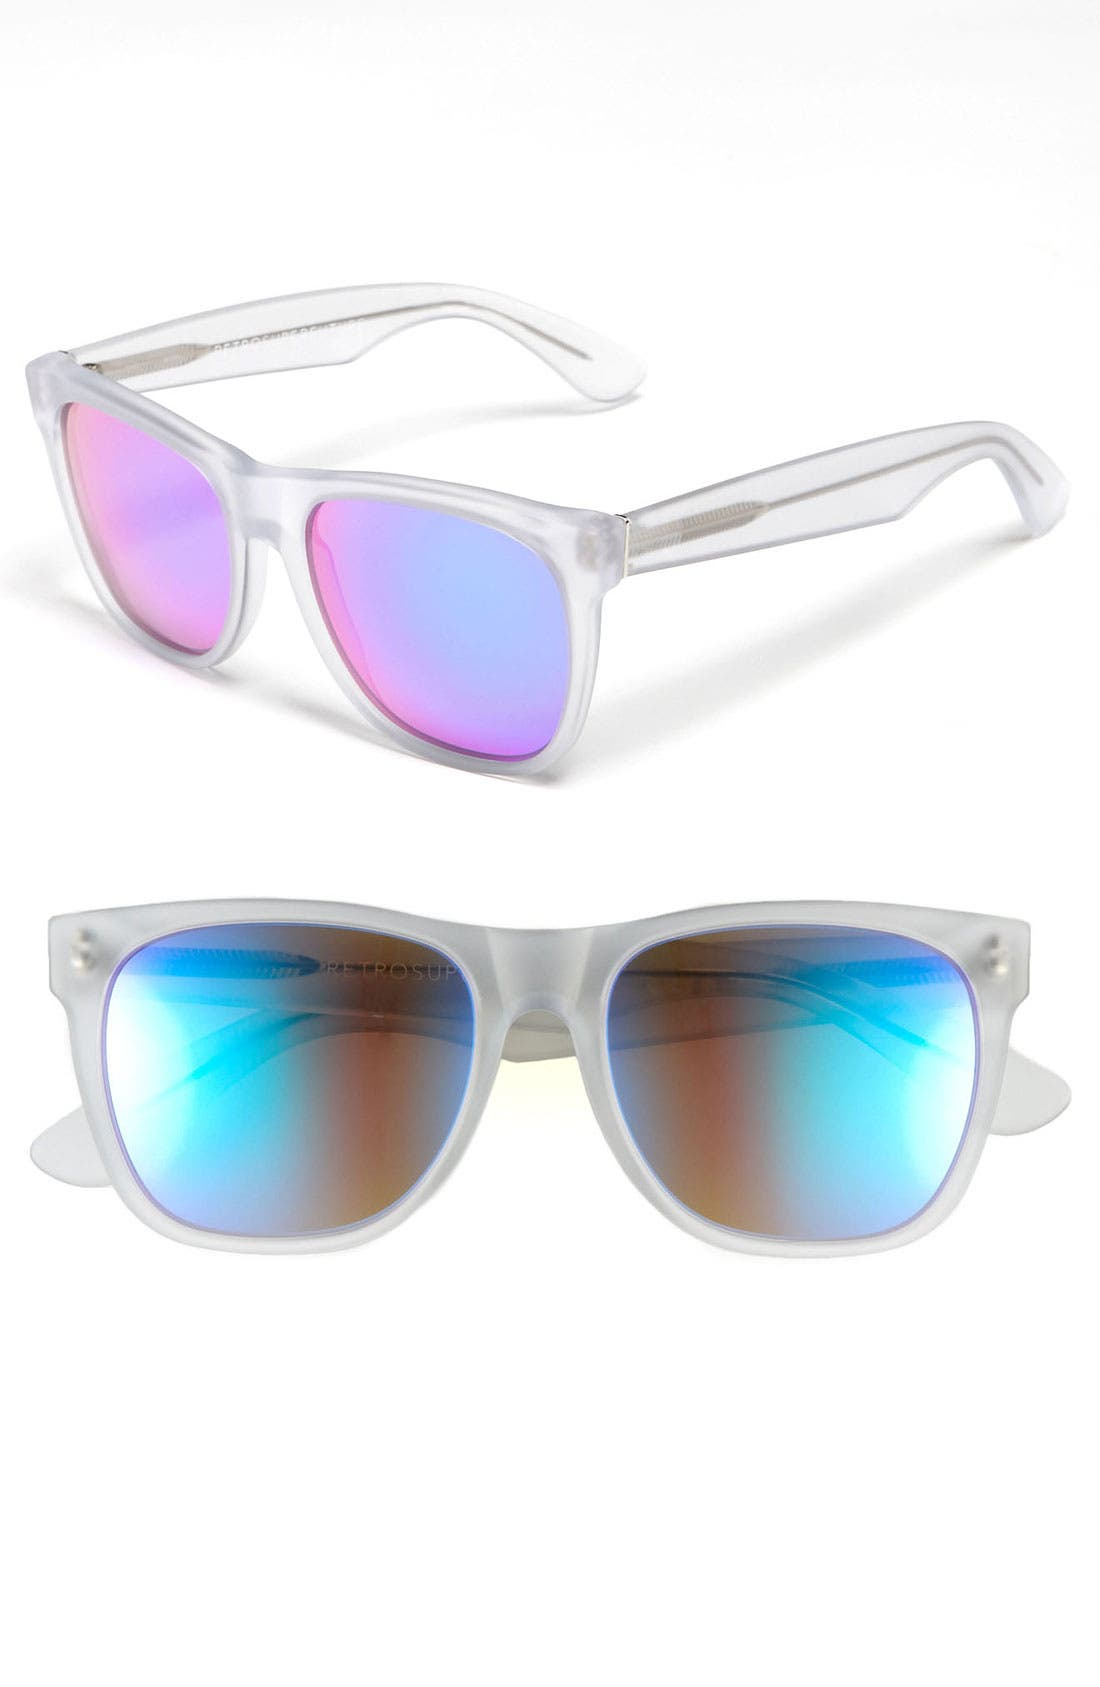 Main Image - SUPER by RETROSUPERFUTURE® 'Basic' 55mm Sunglasses